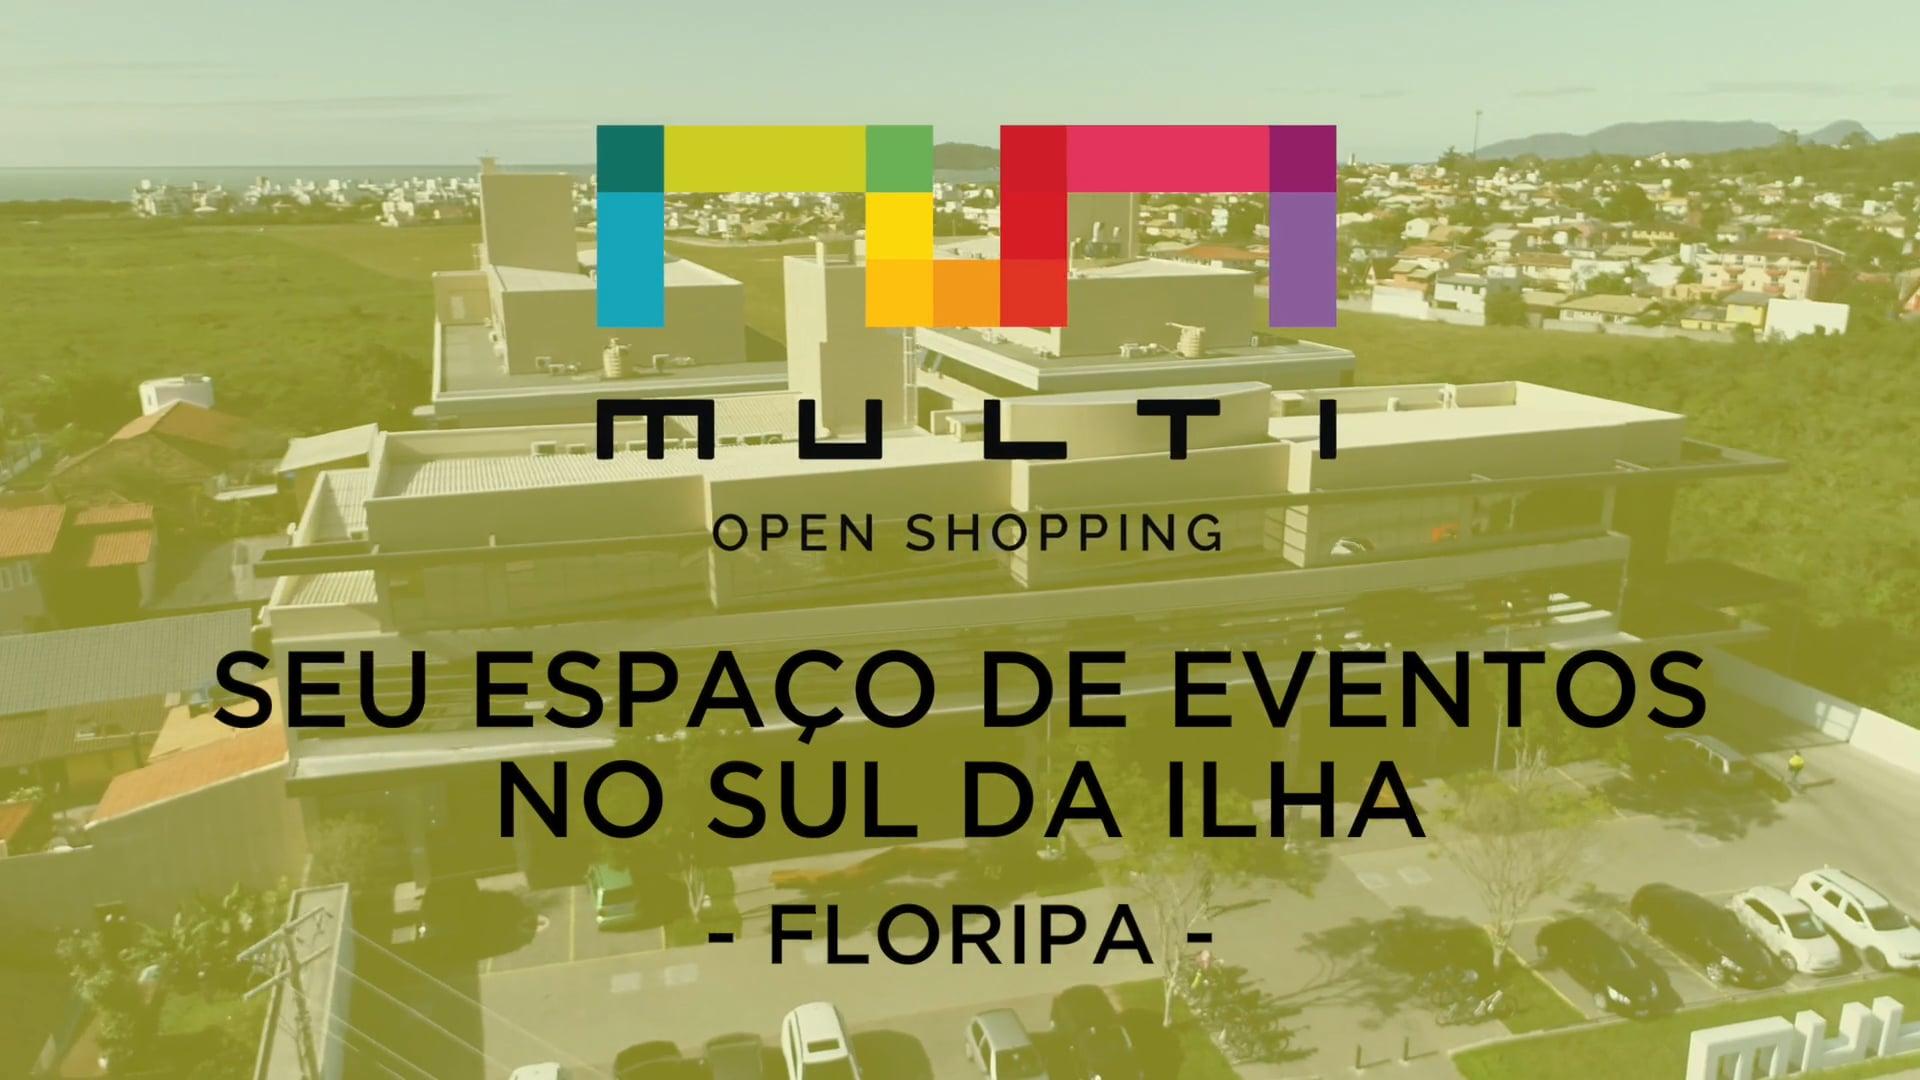 Impact Hub & Multi Open Shopping - Eventos